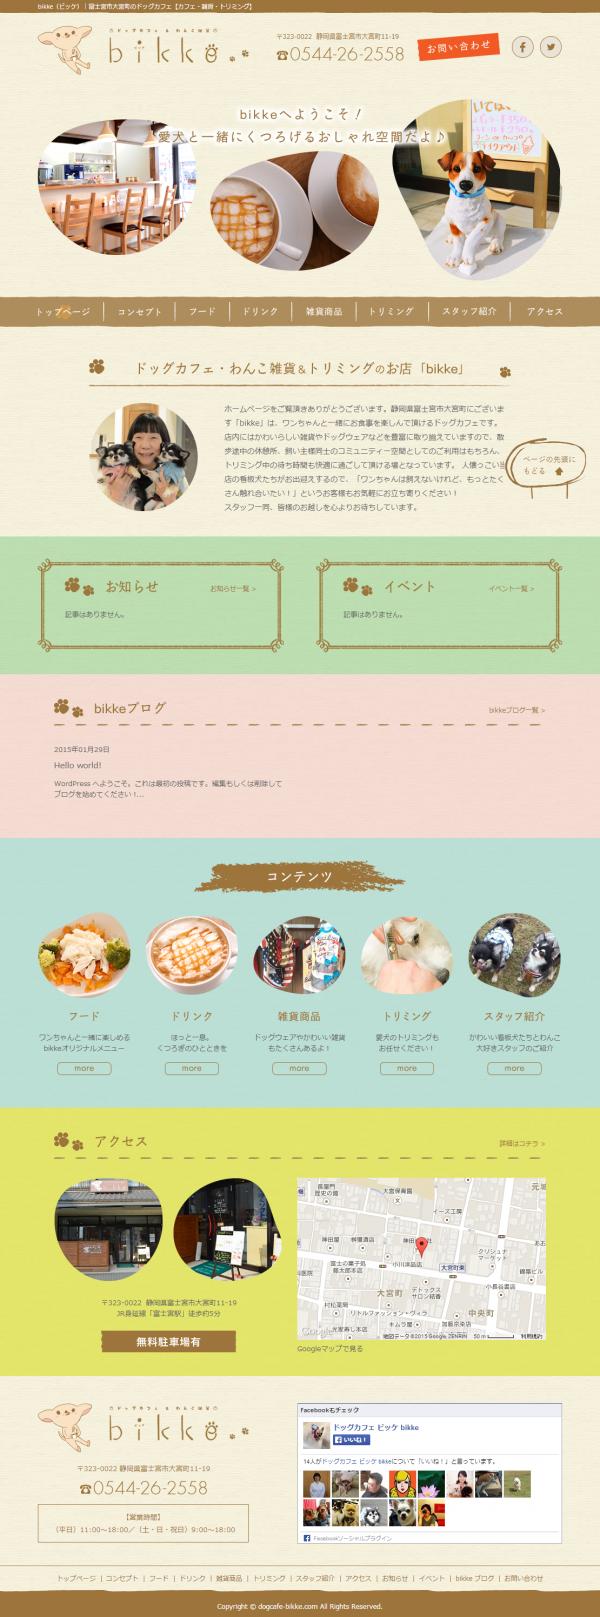 bikke(ビッケ)|富士宮市大宮町のドッグカフェ【カフェ・雑貨・トリミング】